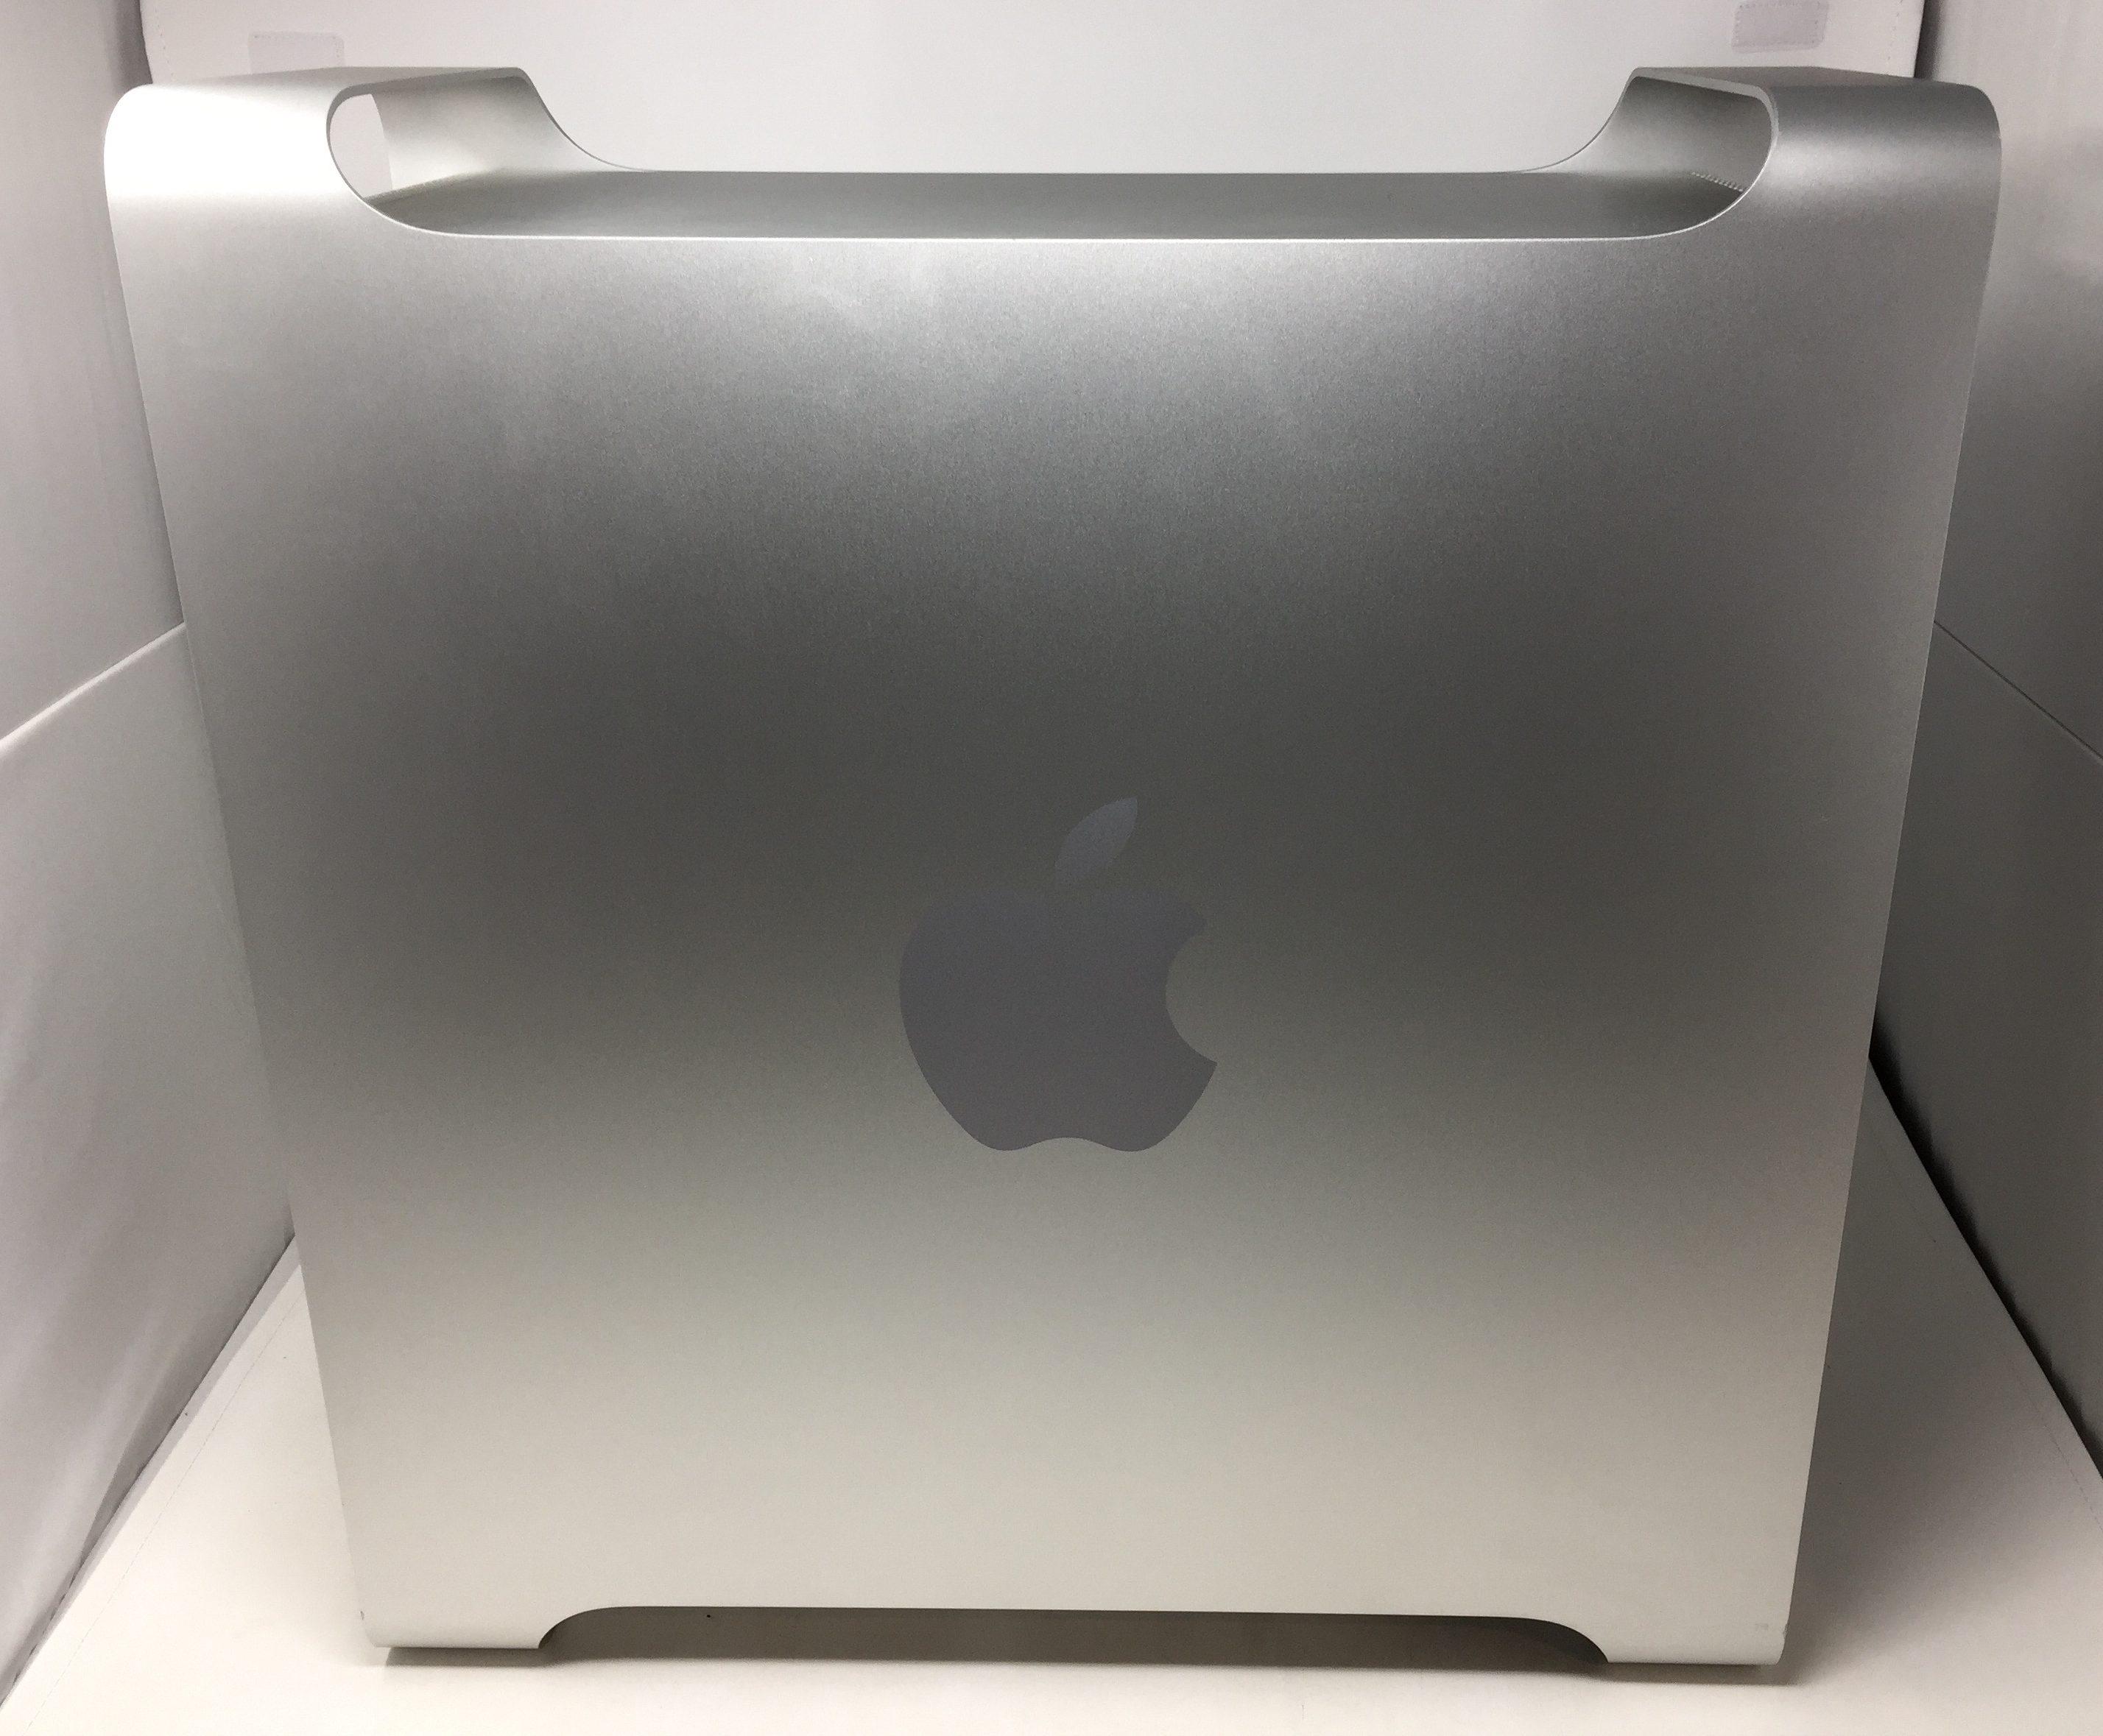 Mac Pro Mid 2012 (2 x Intel Xeon 2.66 GHz 32 GB RAM 1 TB SSD), 6 Core Intel Xeon 2,66 GHz (tiene 2  procesadores iguales), 48 GB DDR3 (ECC) 1333MHz, 4 SSD de 512 GB cada una, imagen 3